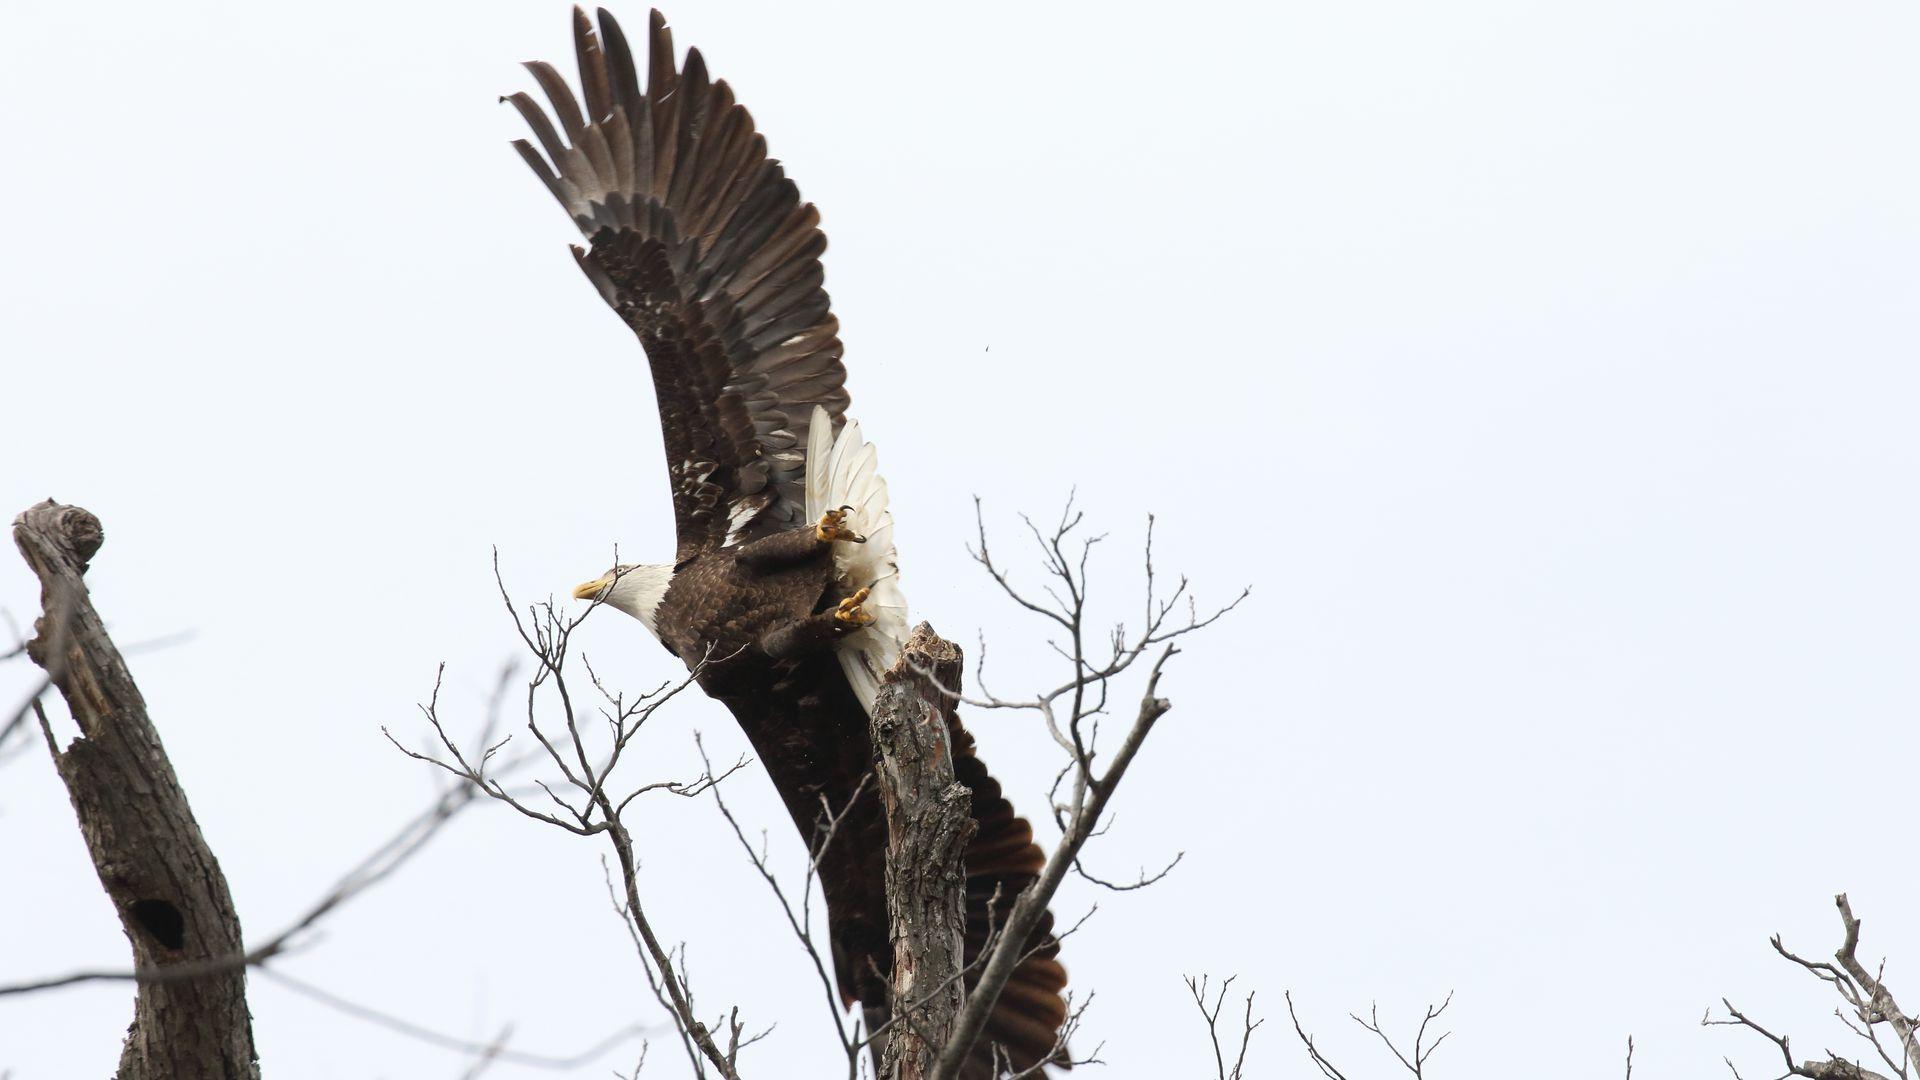 A bald eagle flies over trees.